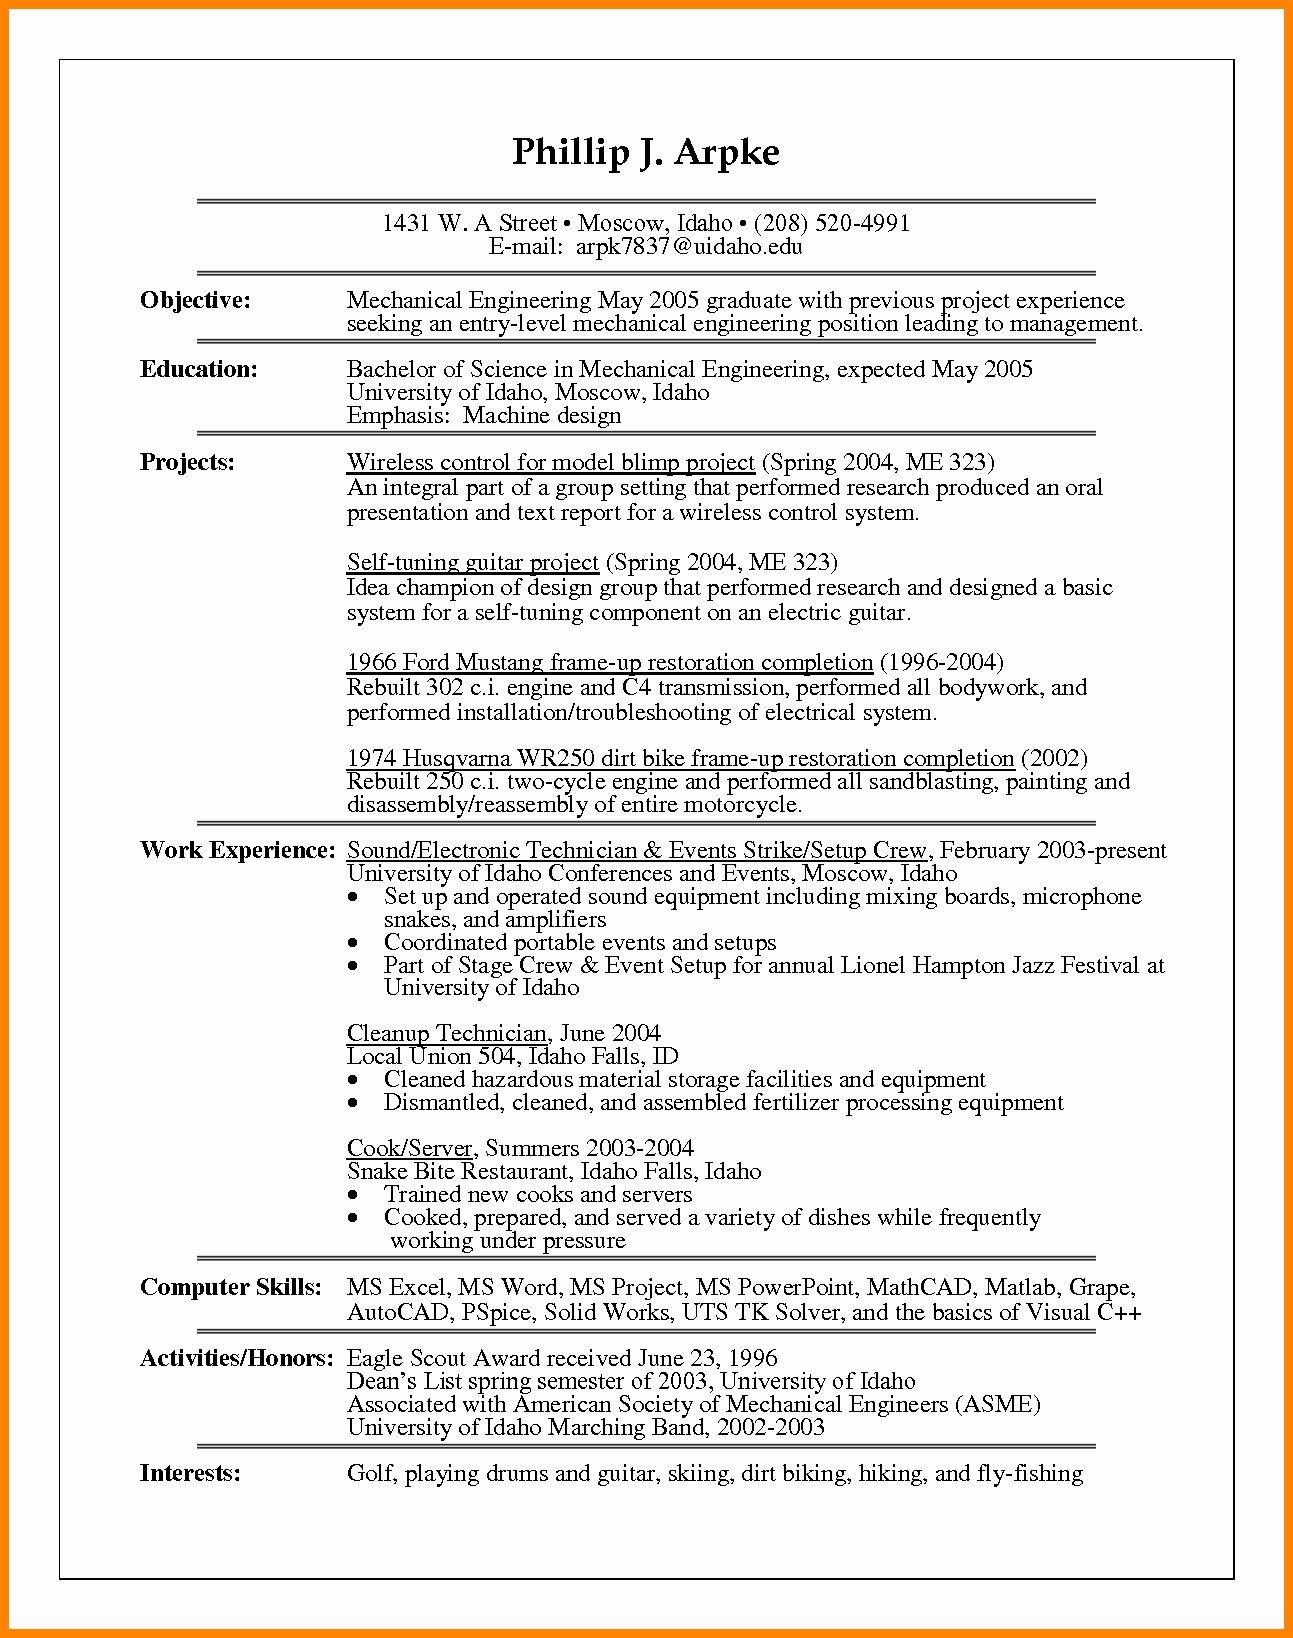 Entry level mechanical engineering resume fresh mechanical